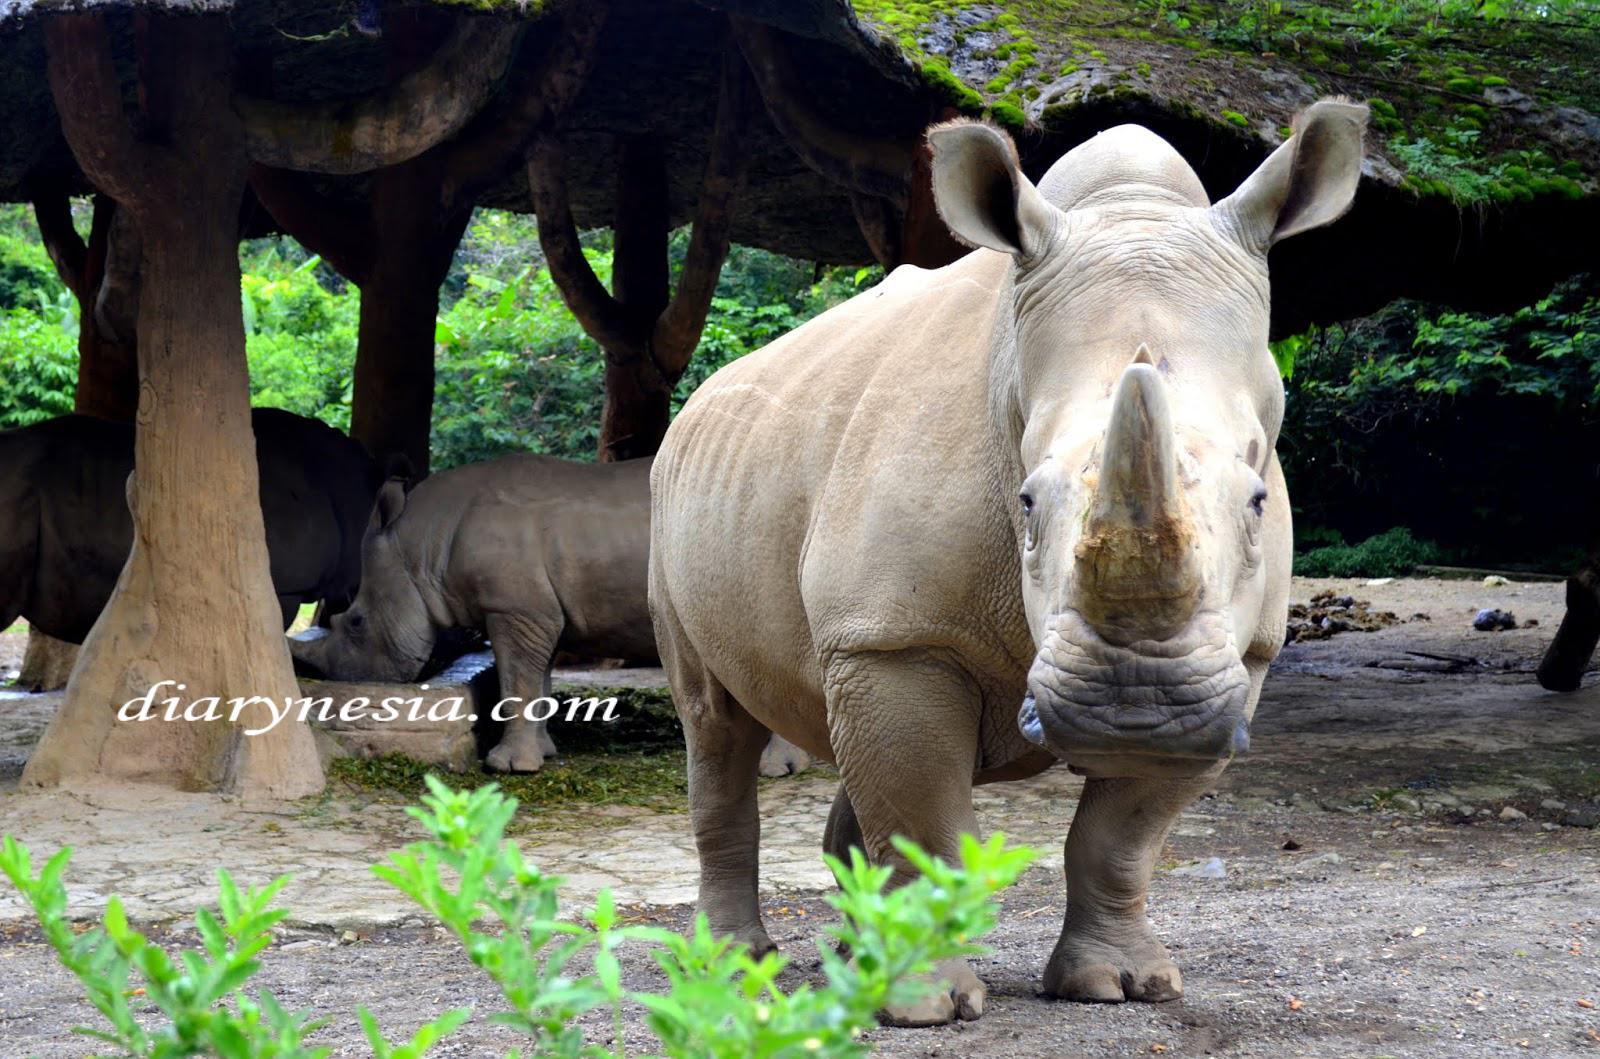 Javan rhinoceros or Rhinoceros sondaicus, how many javan rhinoceros are left in Indonesia, native animals from java, diarynesia